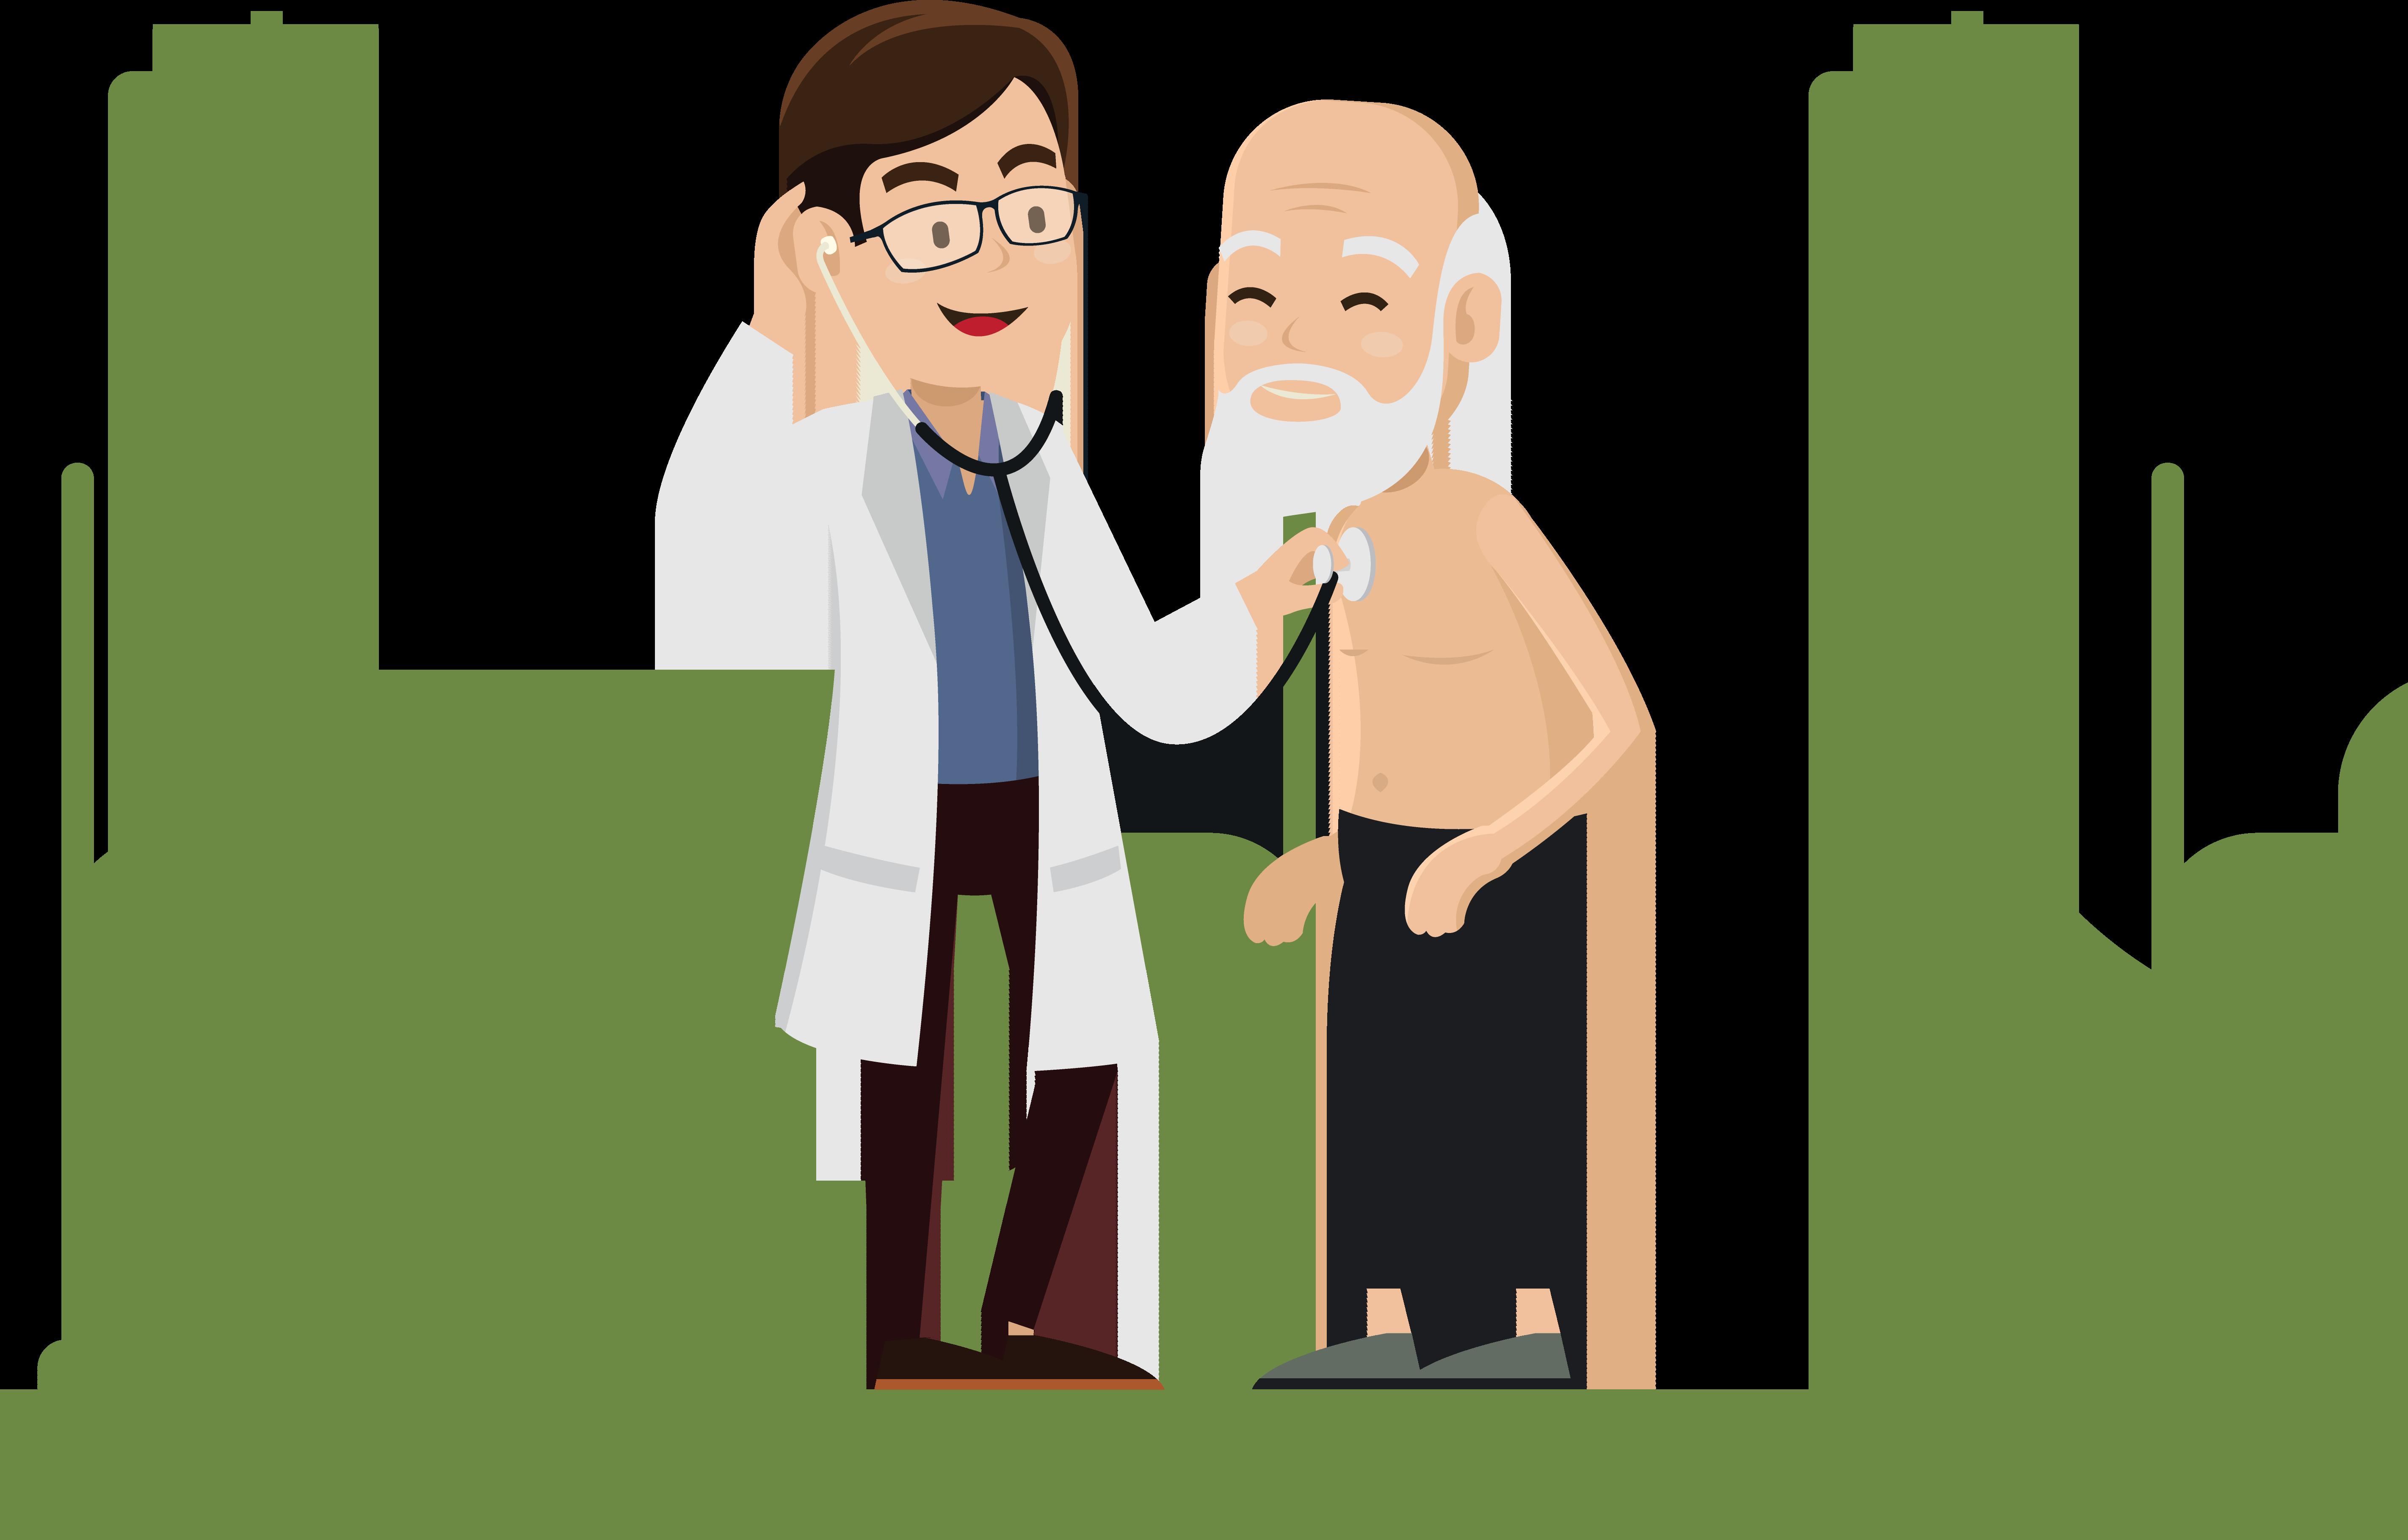 Physician hospital bed doctors. Patient clipart doctor patient communication